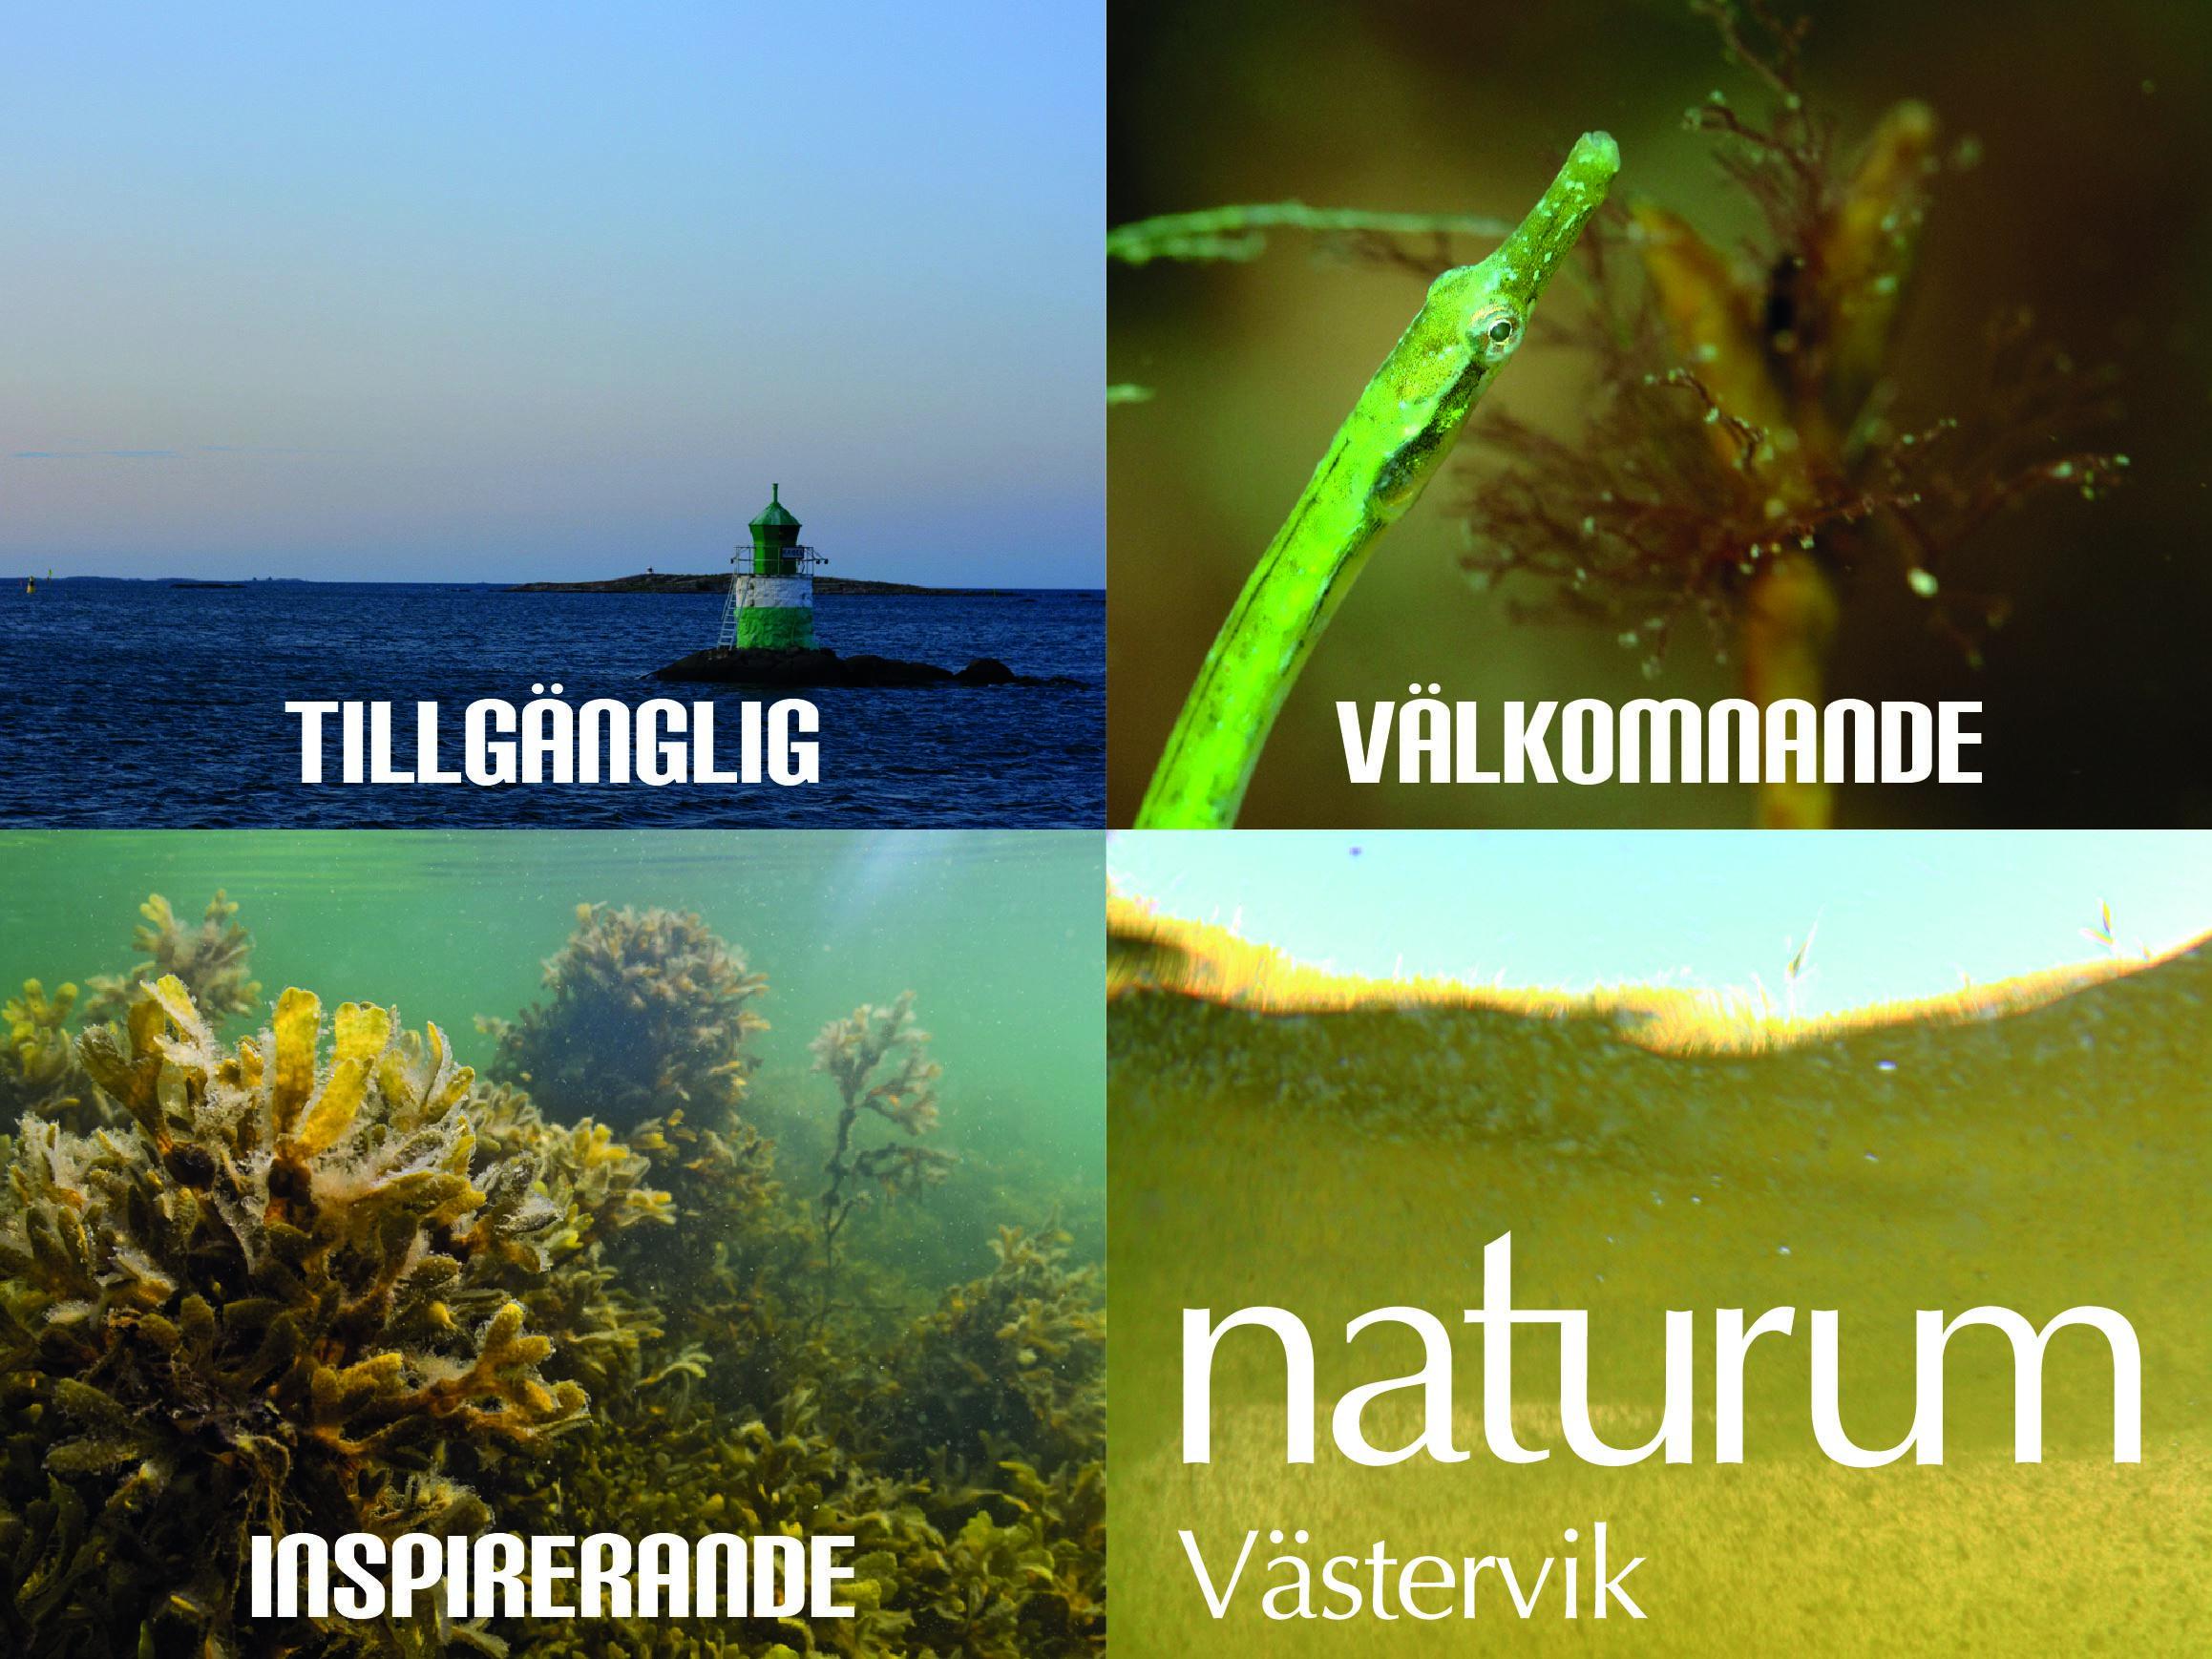 Naturum Västervik